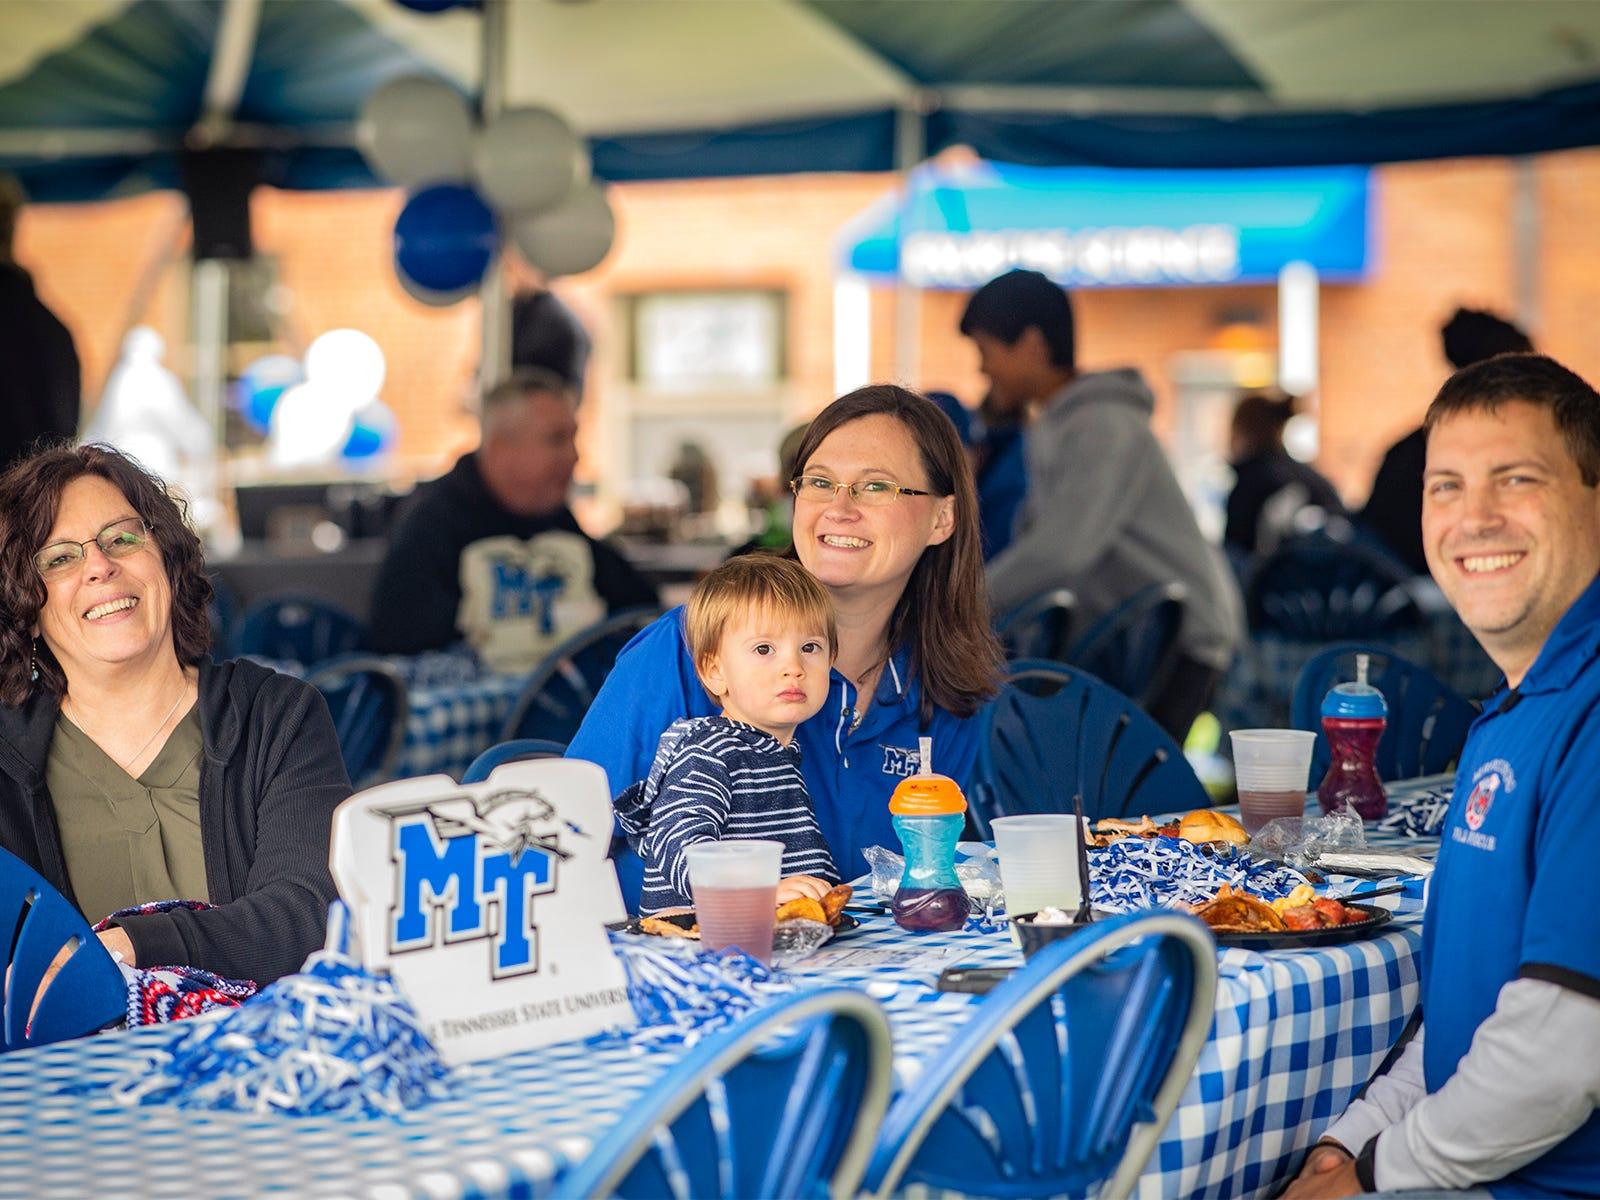 Jan Bartlett, Emily Munoz & son Logan, and Adam Munoz enjoy the Alumni tailgate luncheon after the parade.